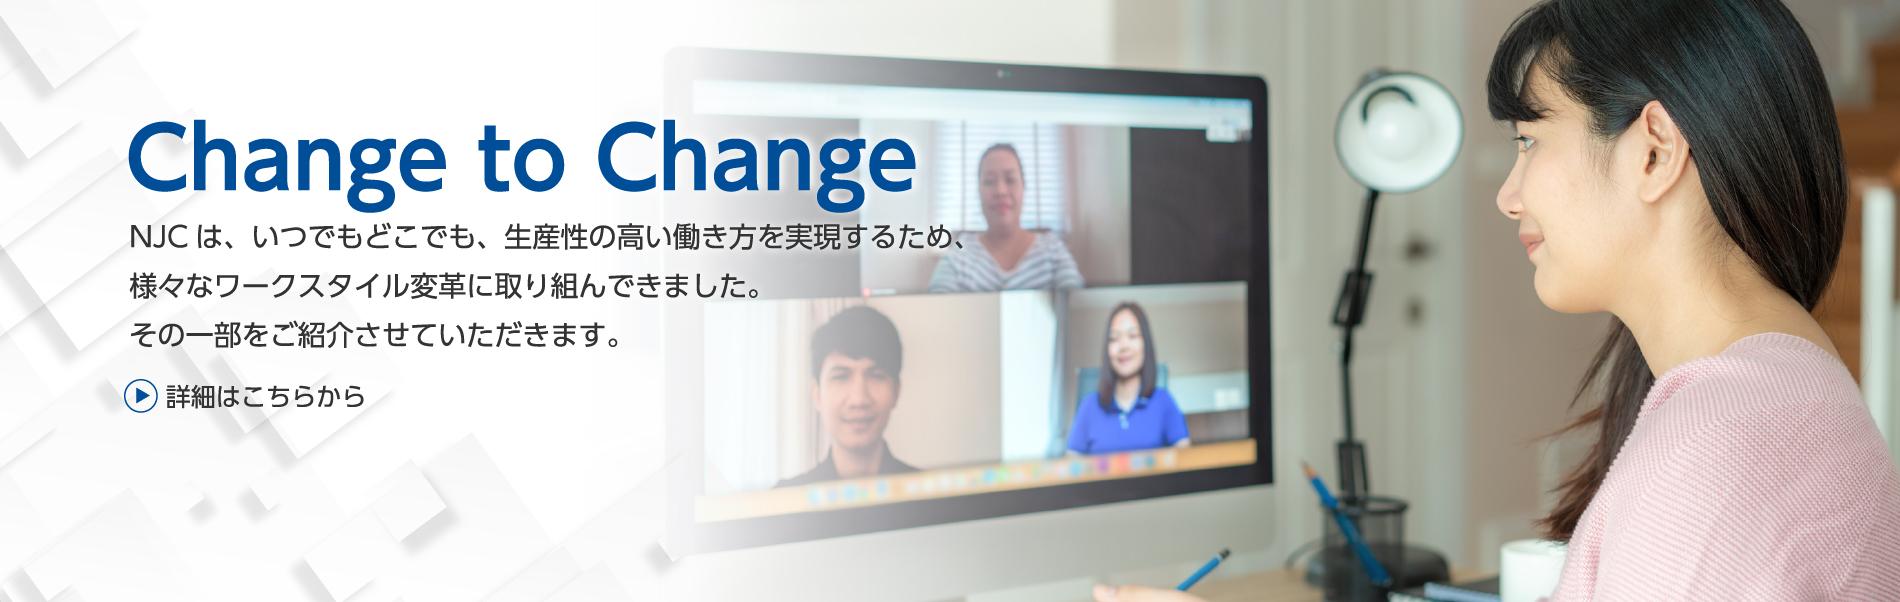 Change to Change